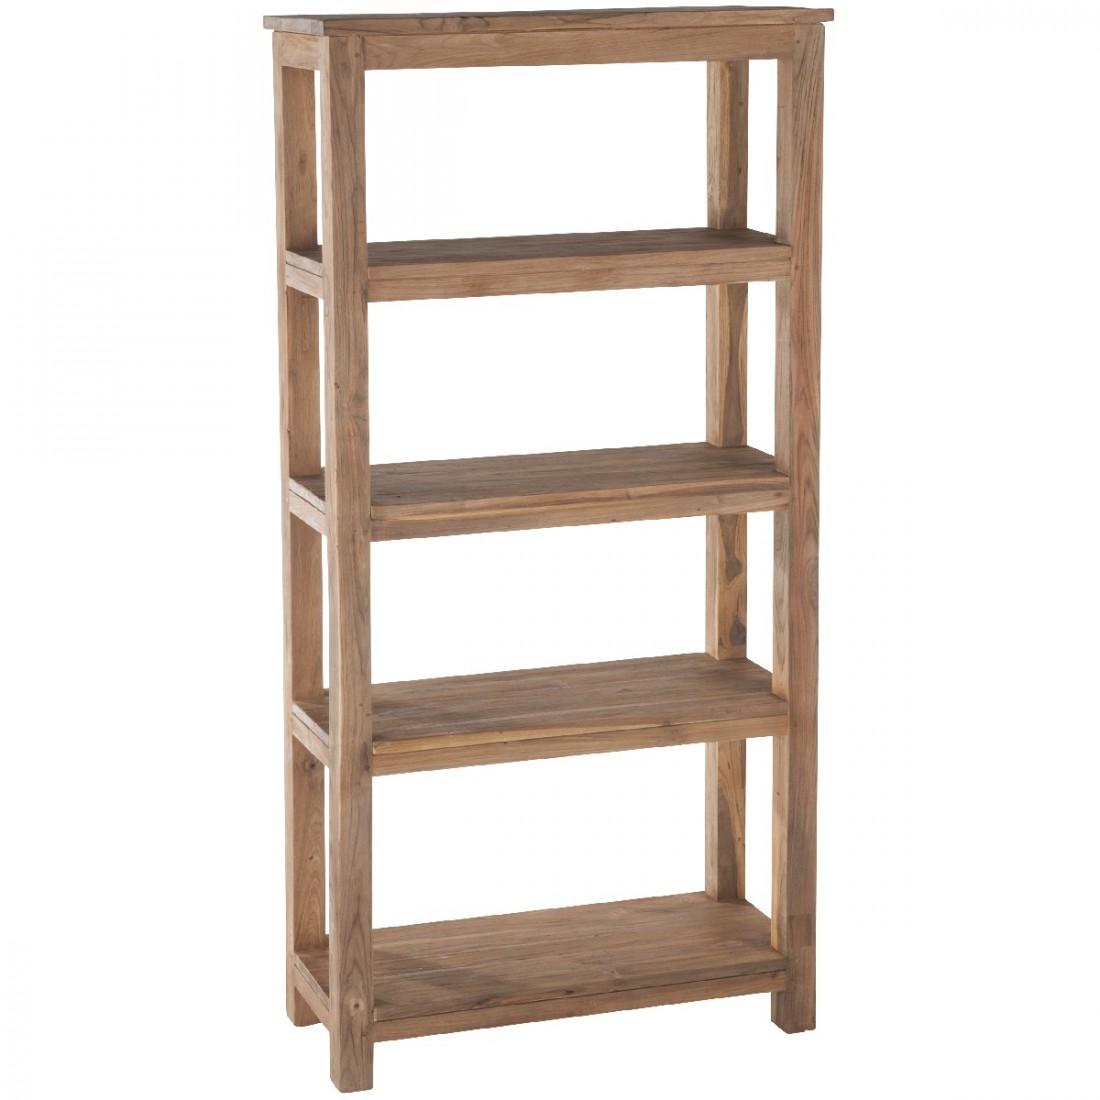 etag re 5 niveaux en teck bross recycl drift. Black Bedroom Furniture Sets. Home Design Ideas